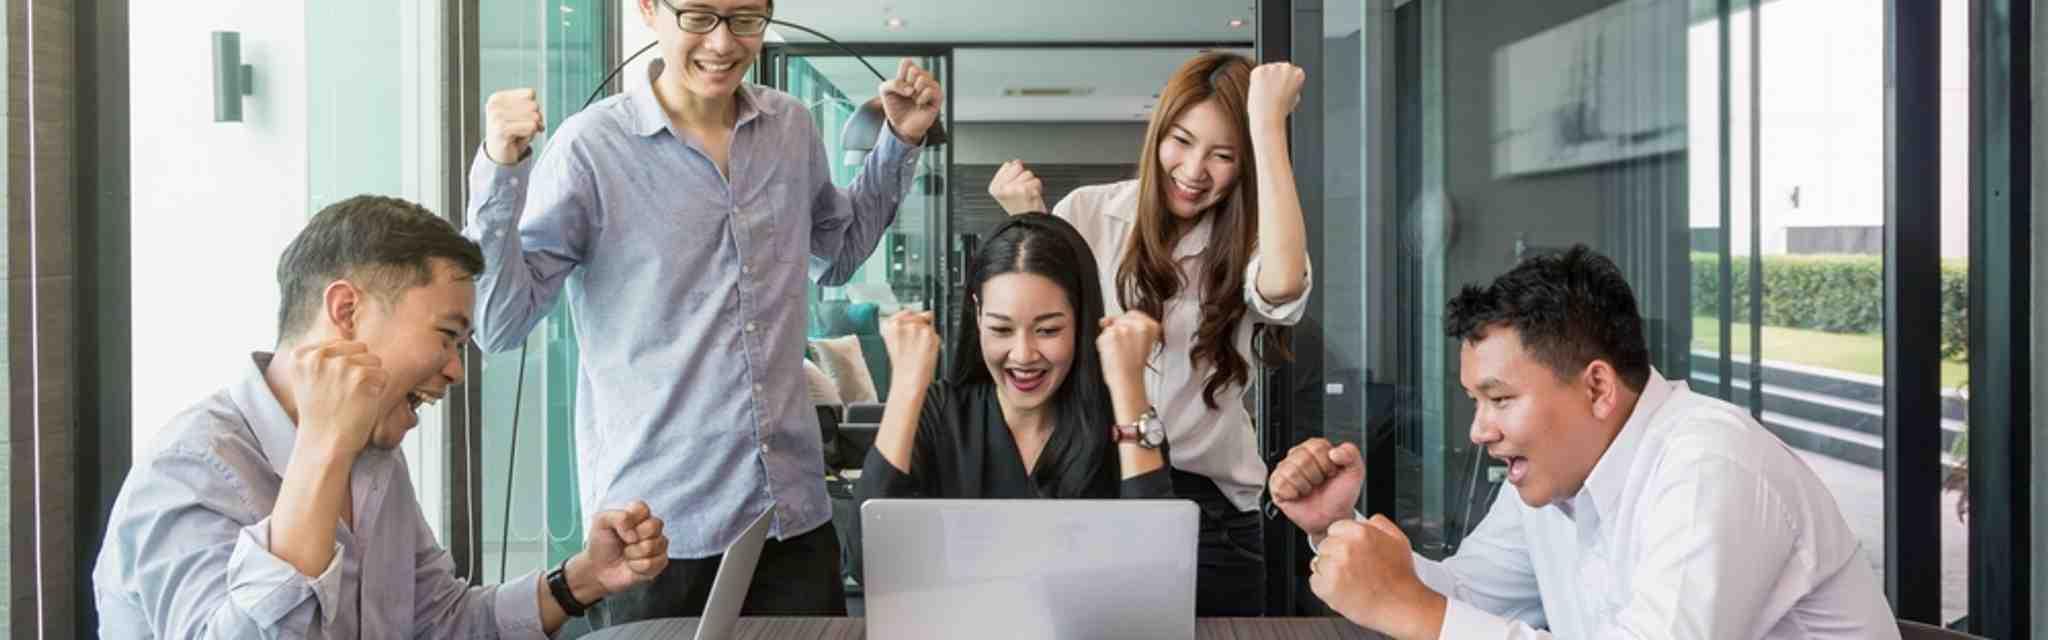 Raih Banyak Pelanggan dengan EasyLink AXES by Traveloka, Xperience Team